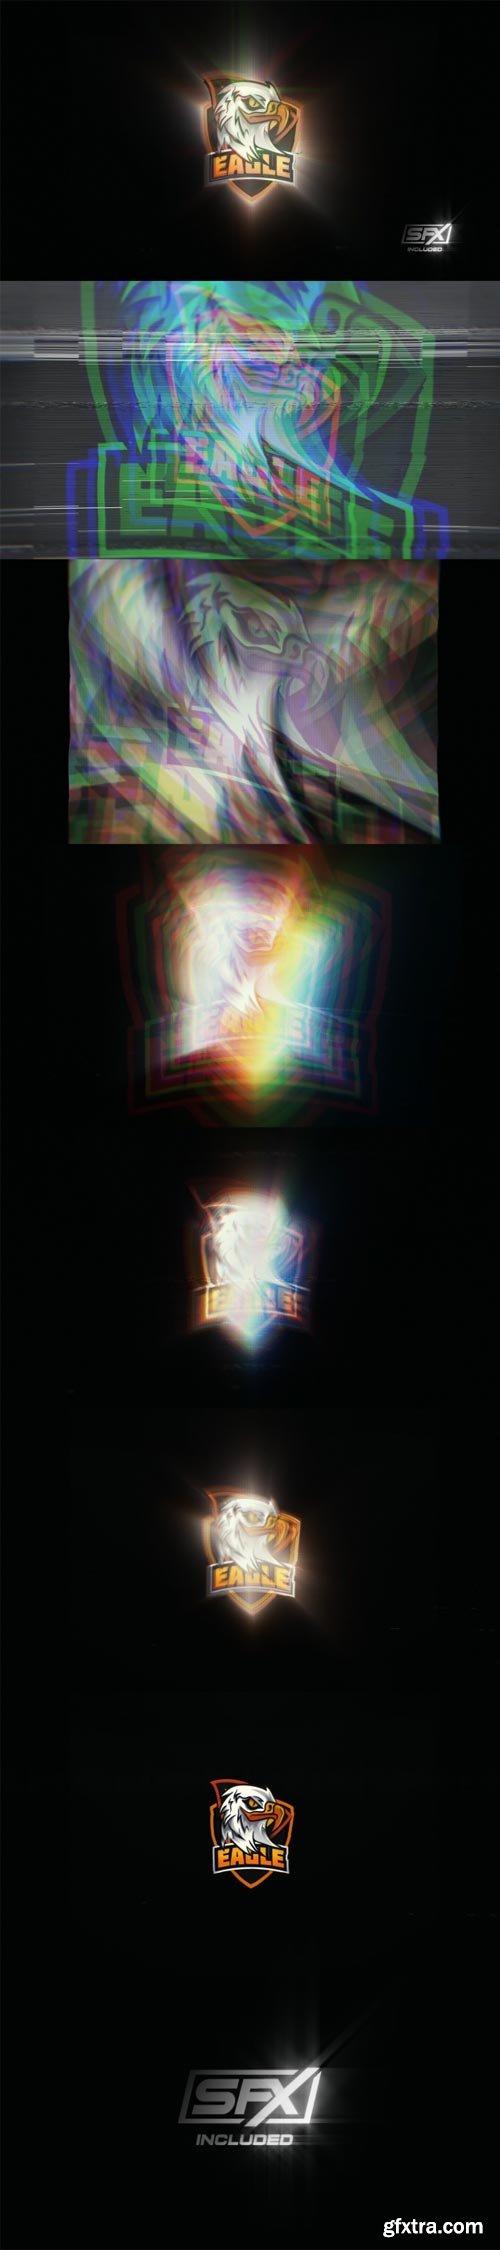 Videohive - Glitch Gaming Logo Reveal - 28620958